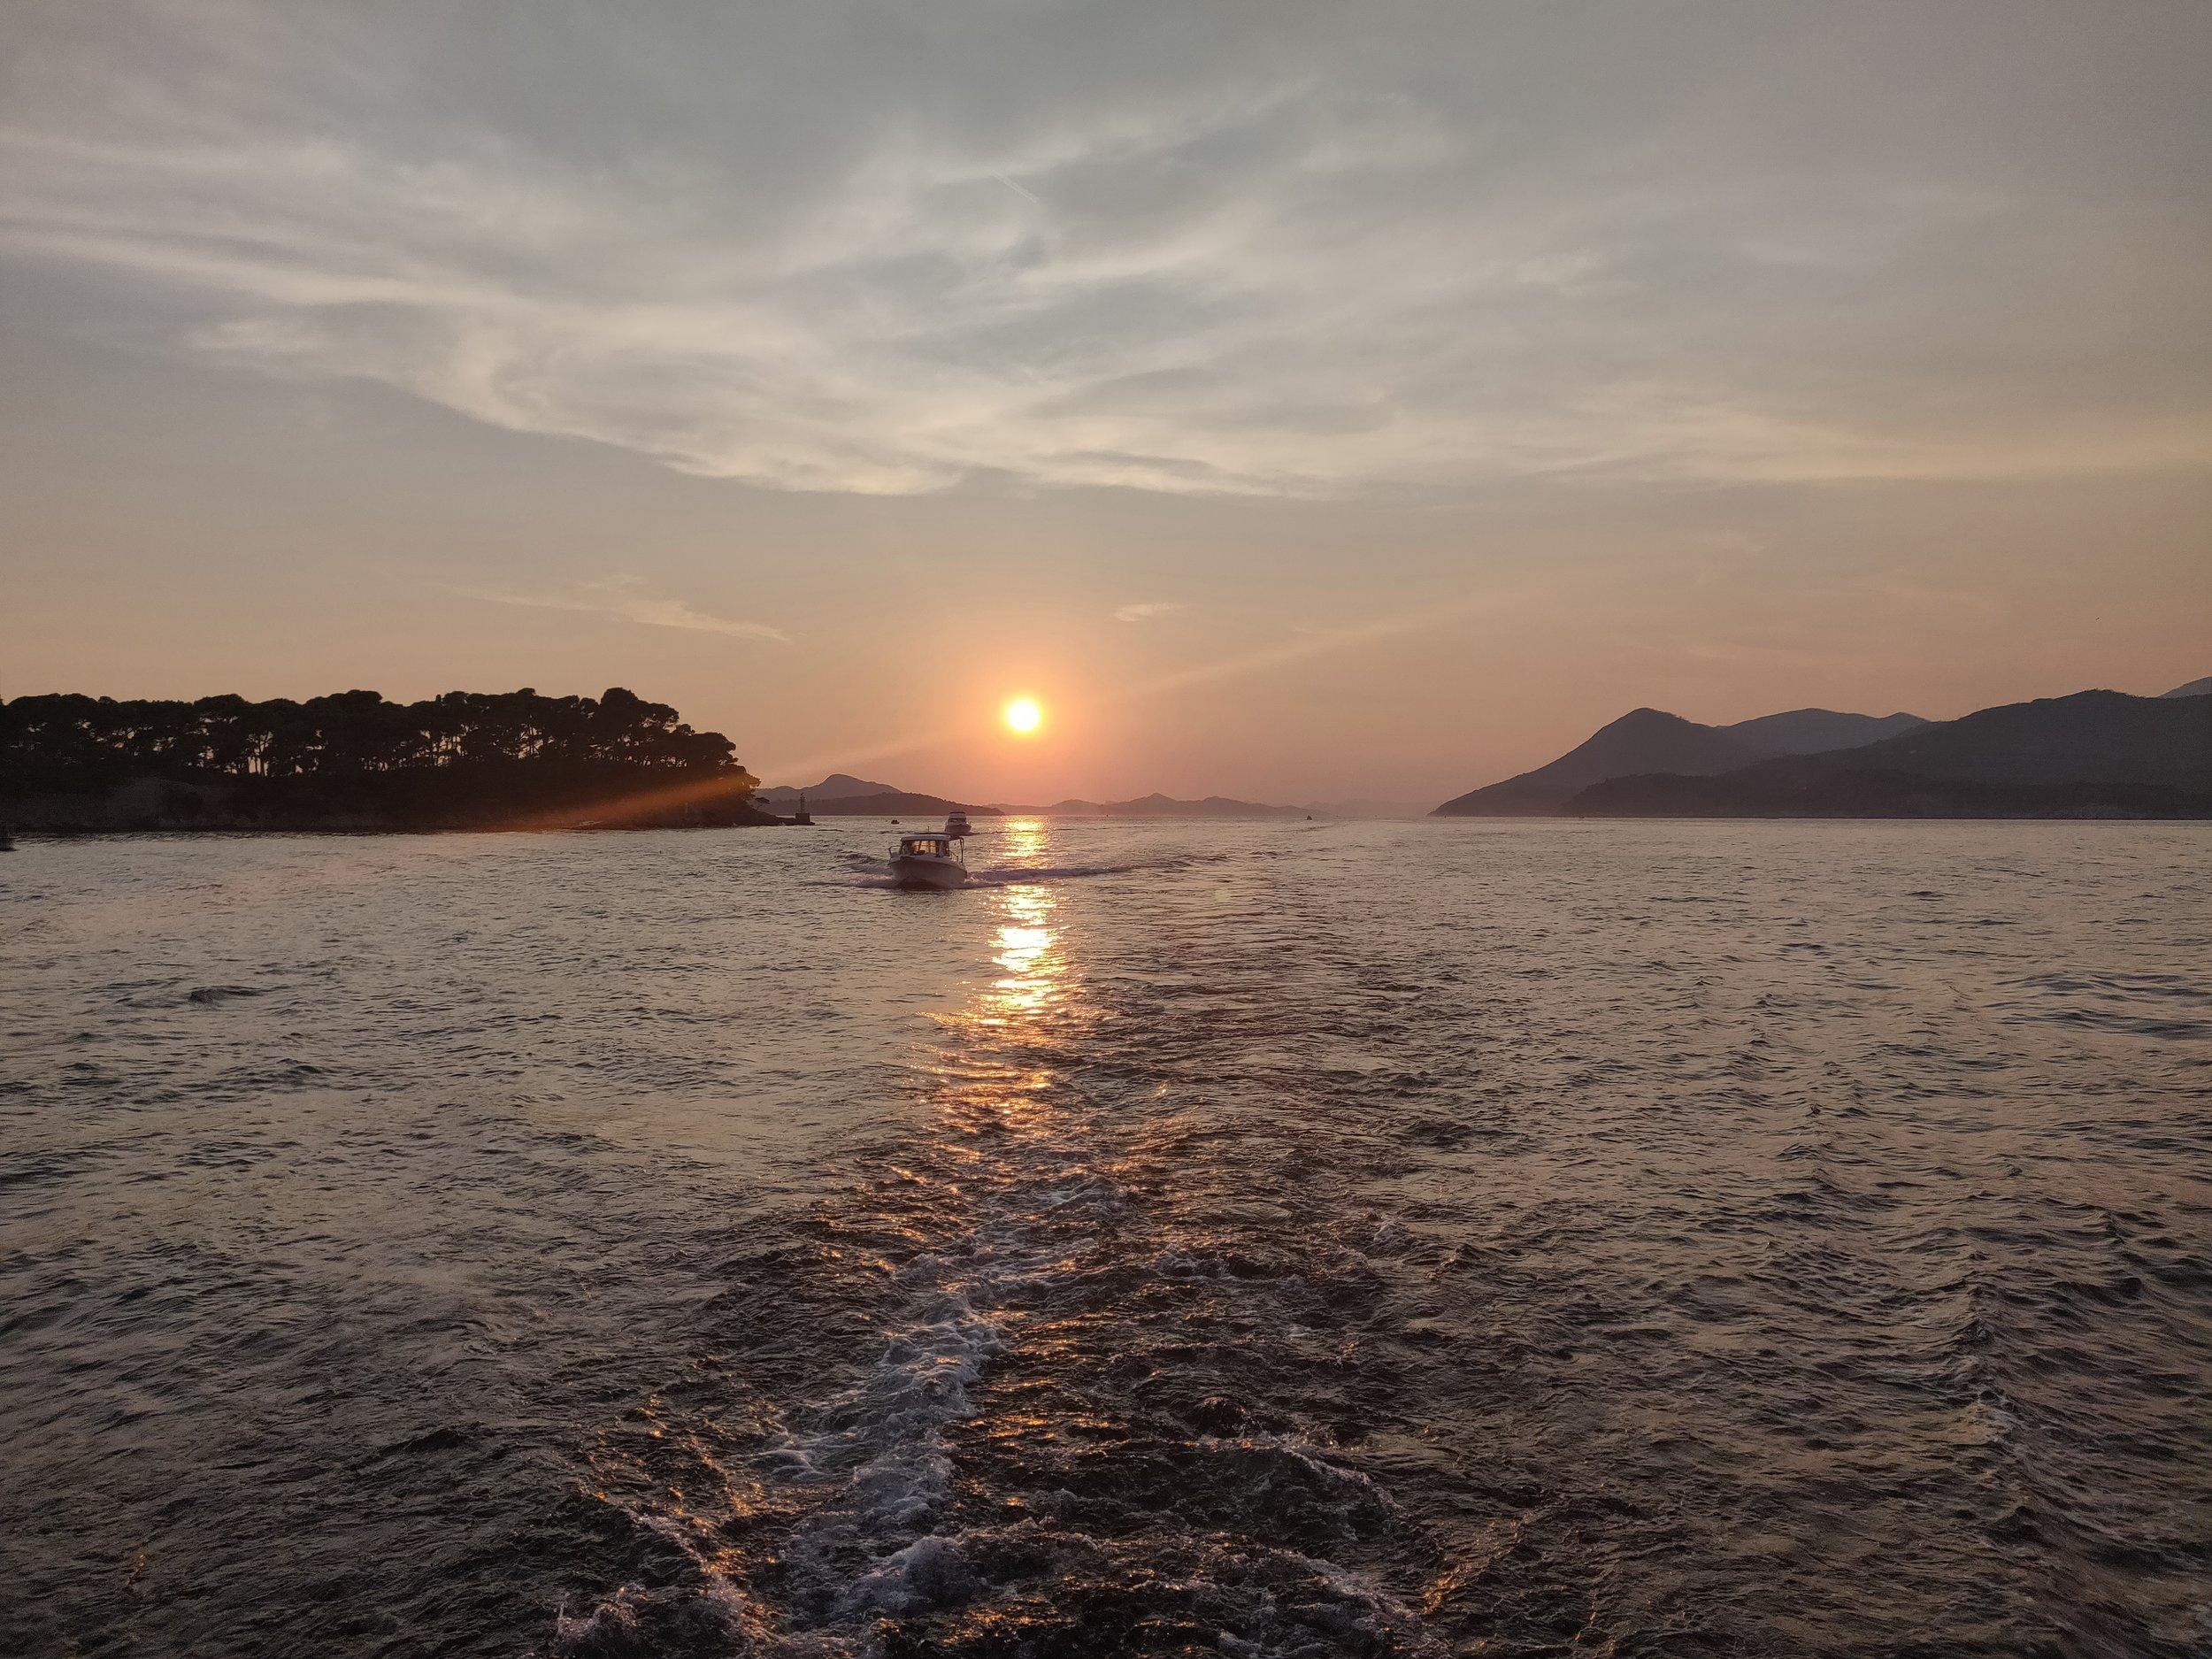 Oneplus 6 Sunset